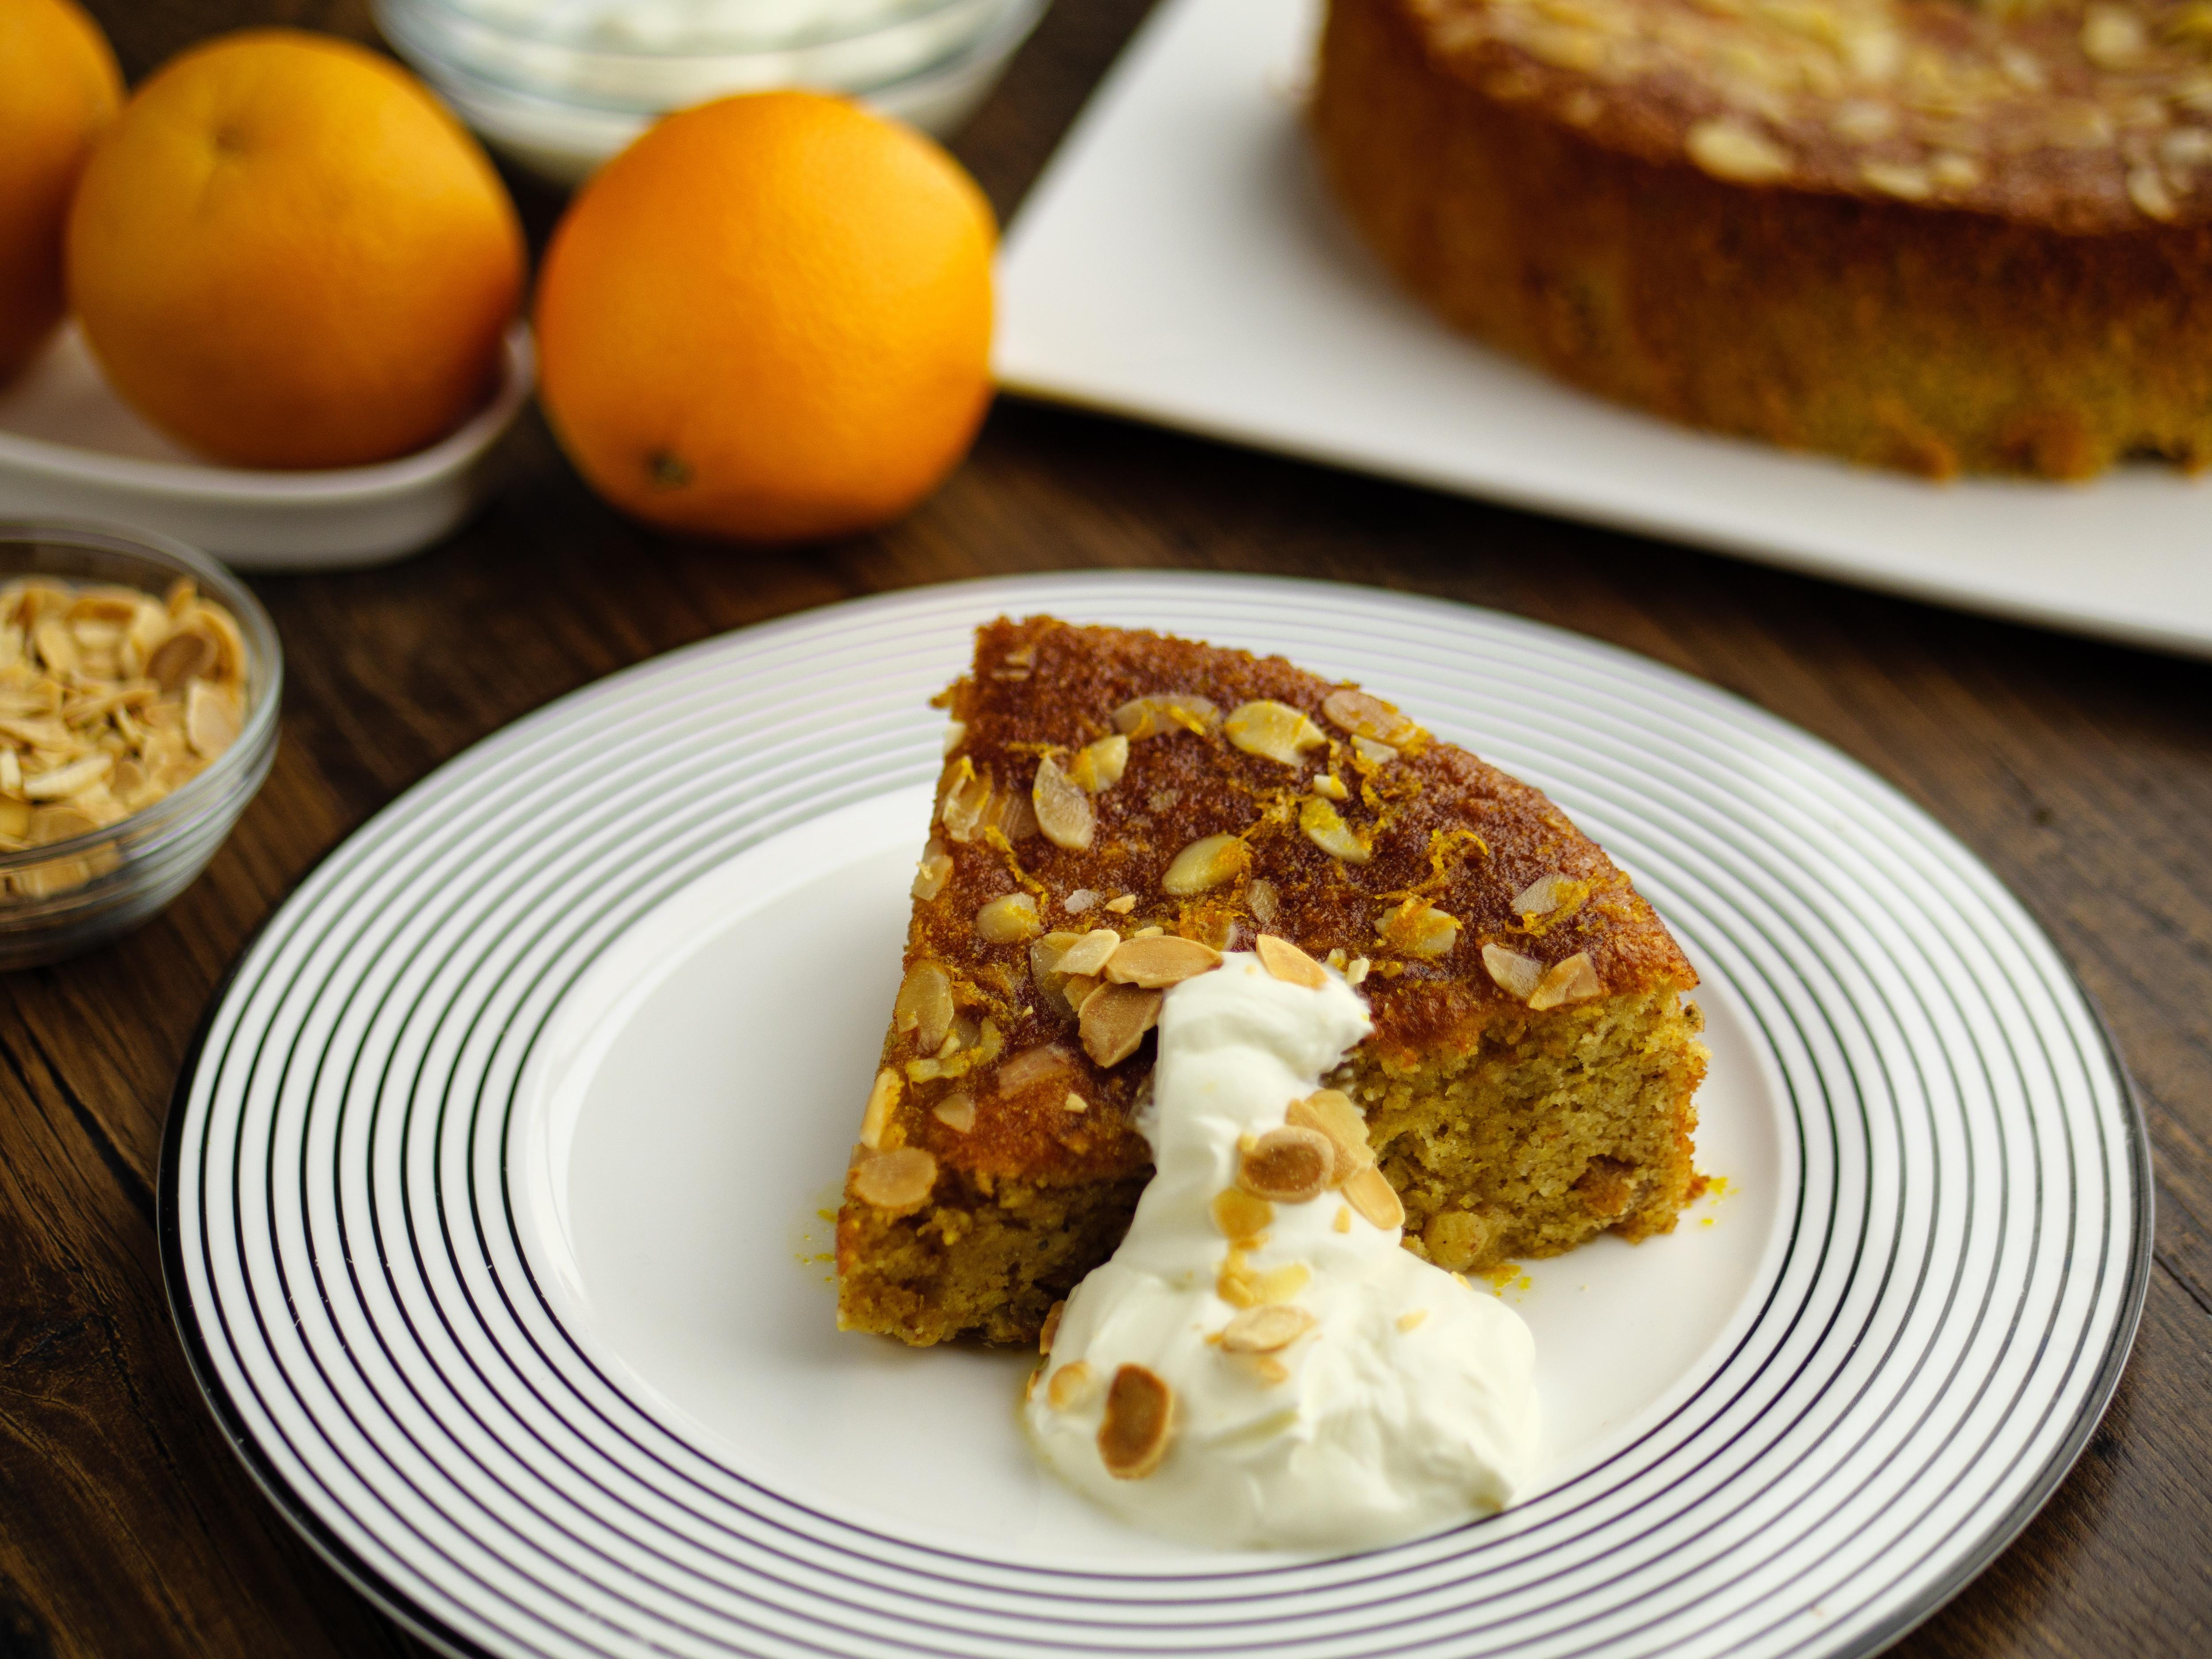 Orange, Cardamom And Raisin Cake